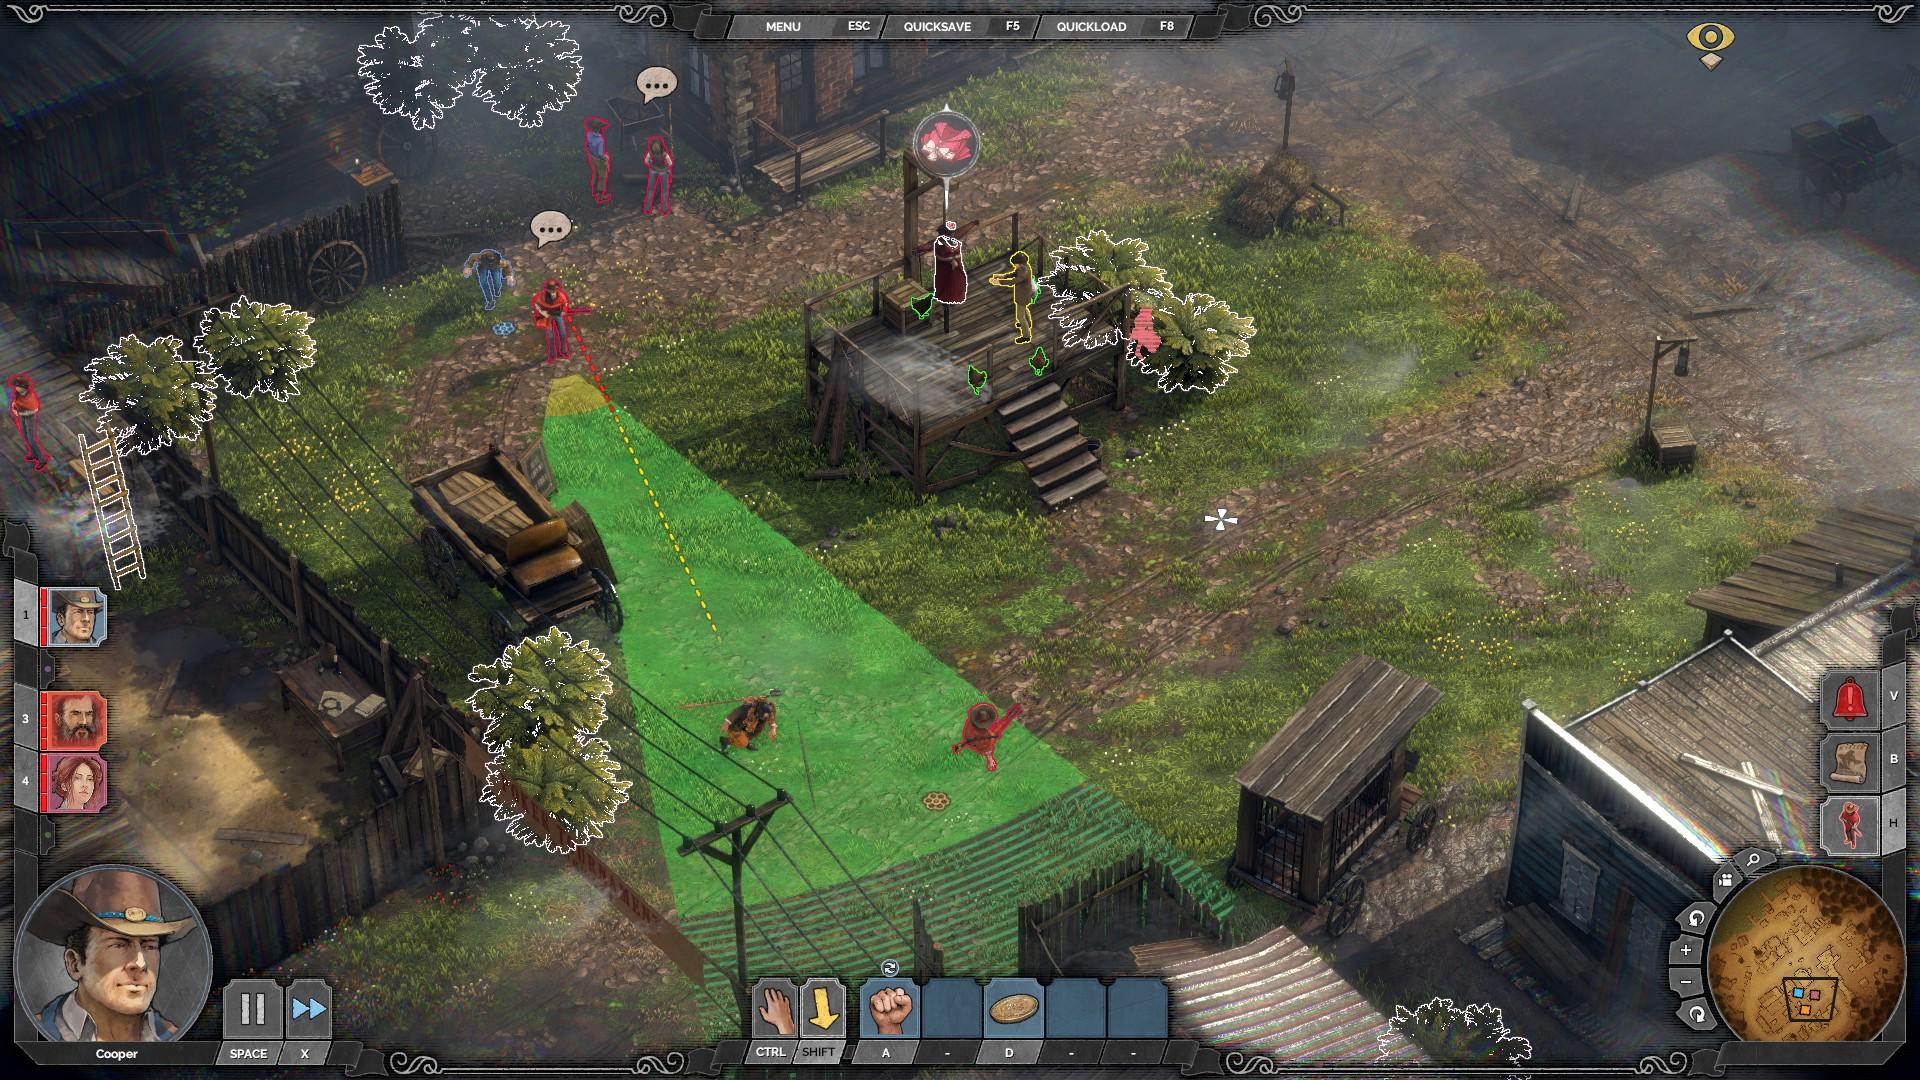 Desperados 3 Review The Indie Game Website